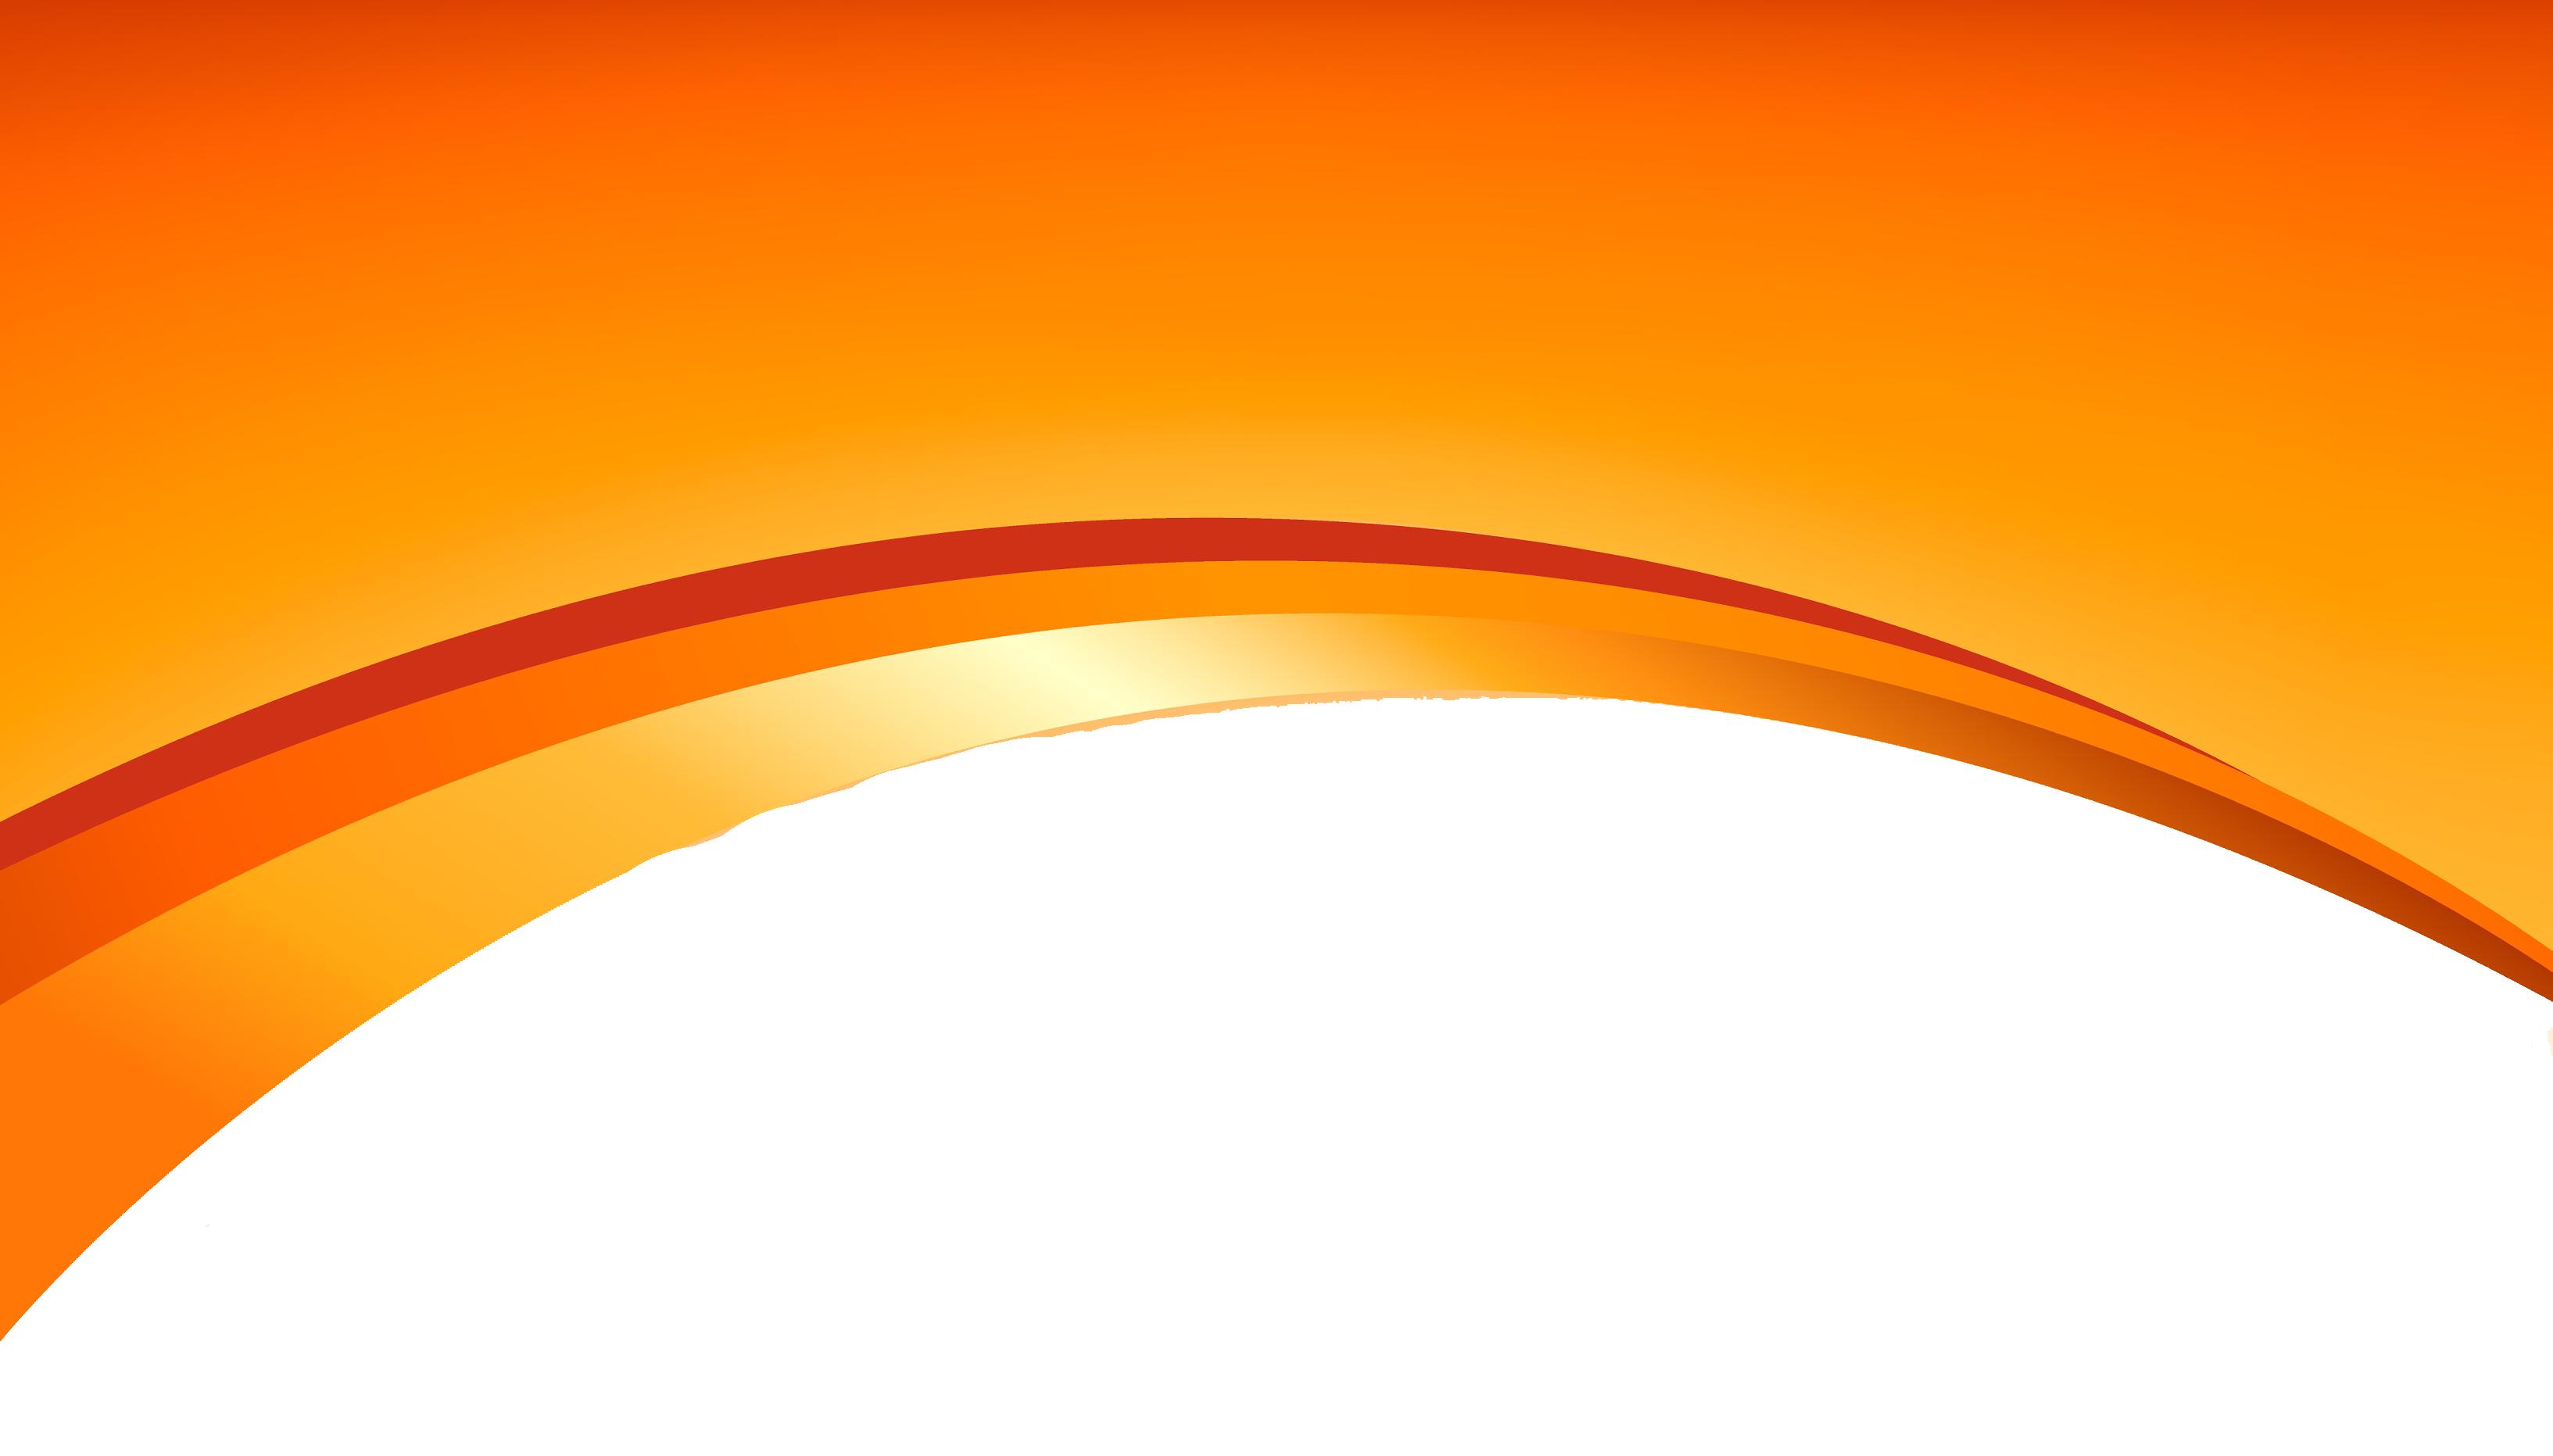 orange and white wallpaper